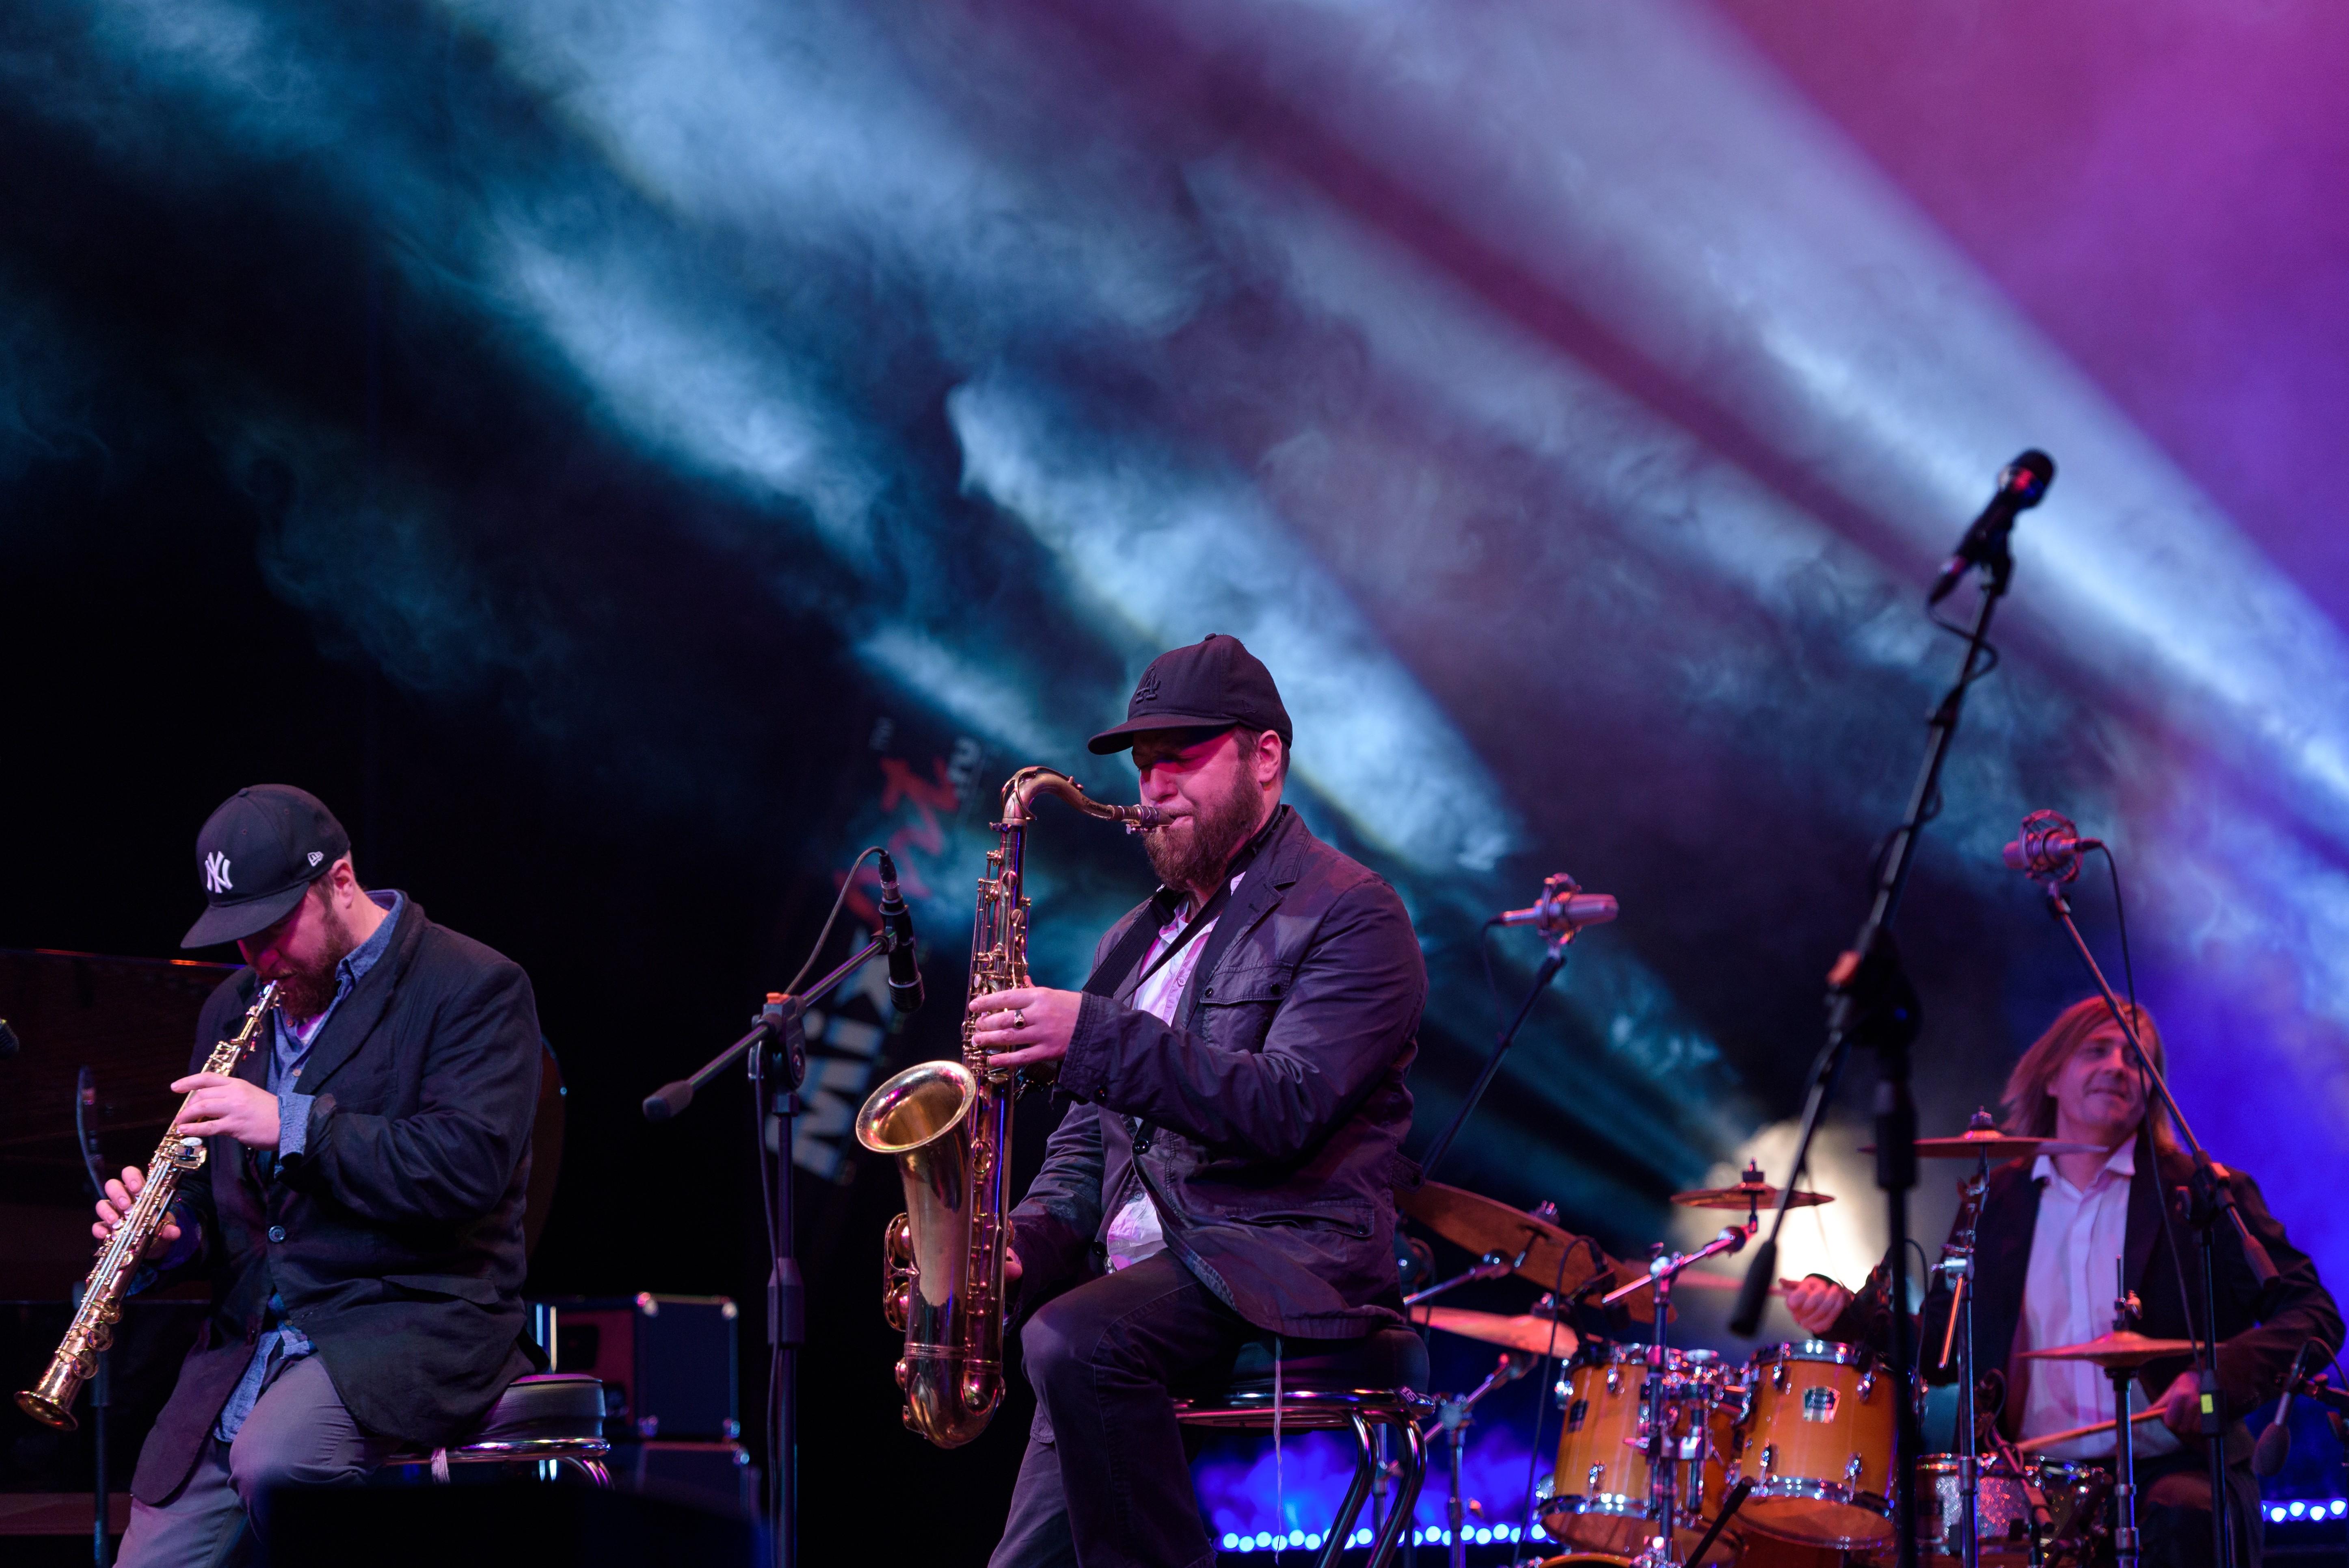 Фотогалерея  фестиваля «Дельта — джаз»